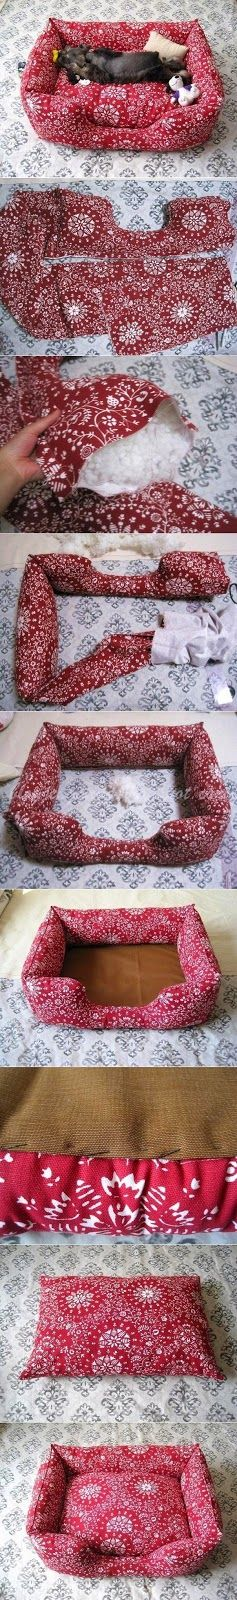 DIY Tutorial membuat kasur kucing/anjing | La femme écrit